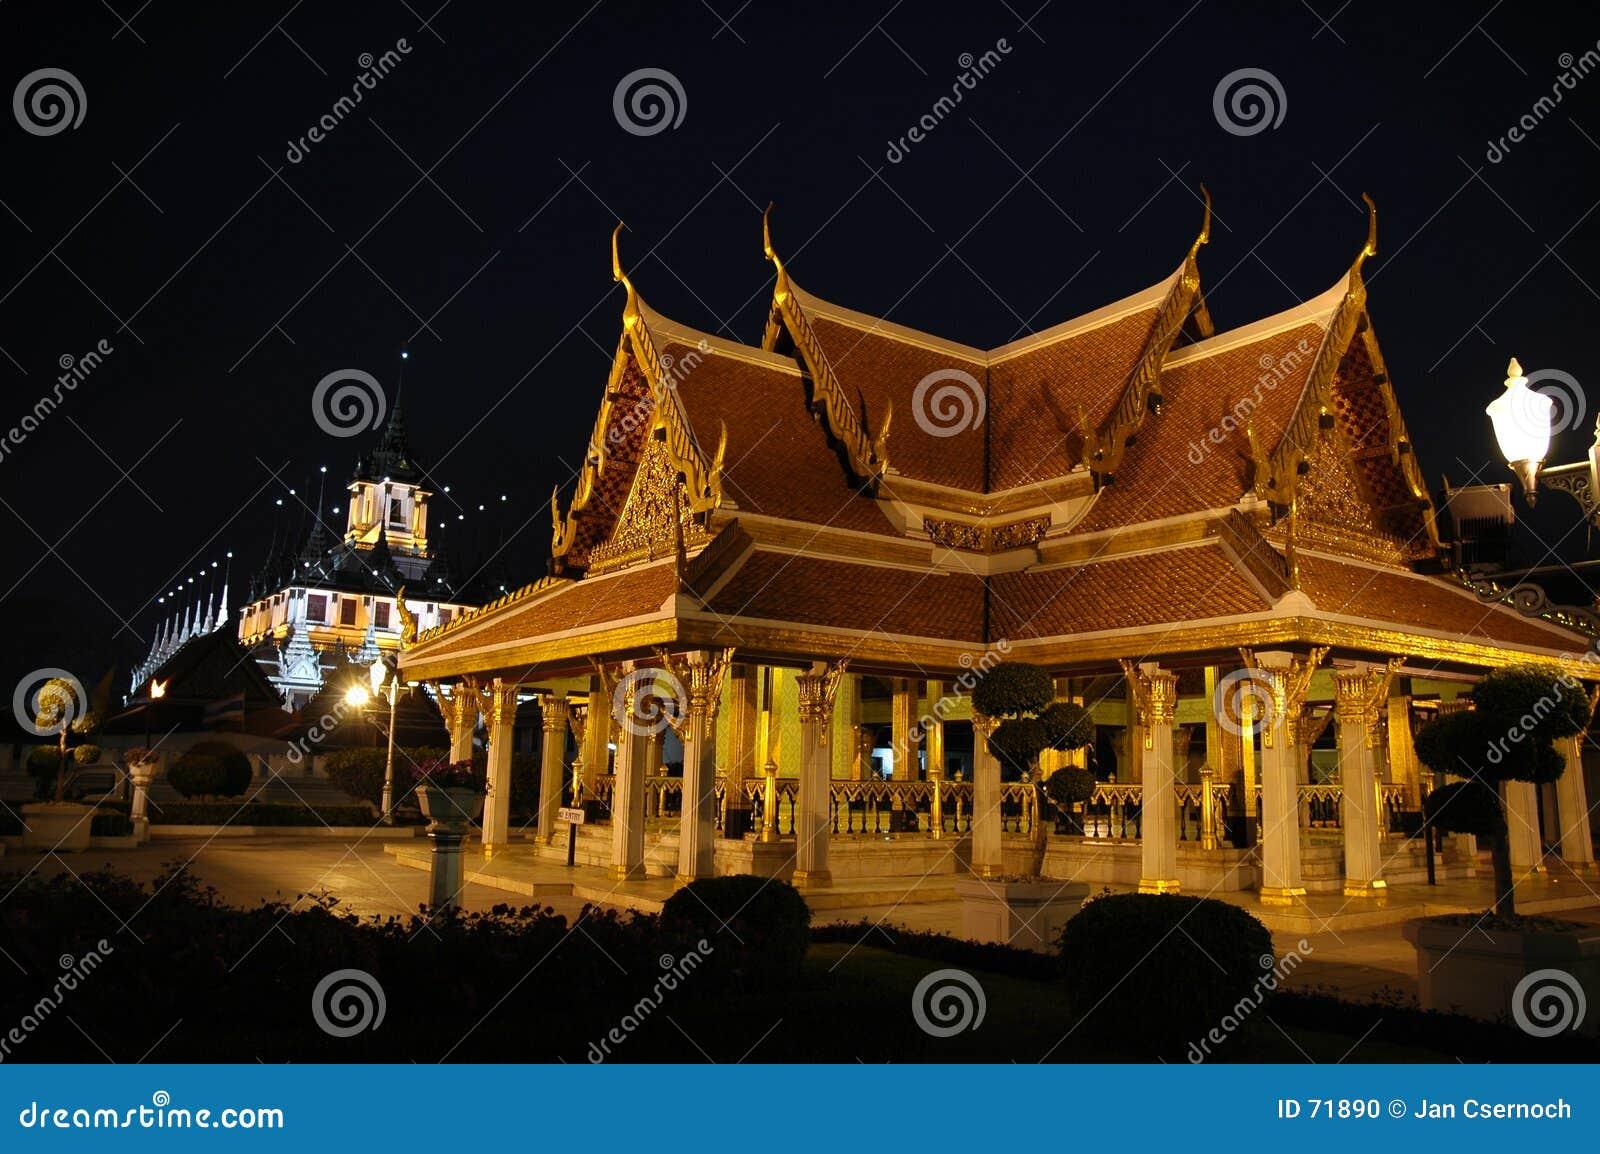 Royal Buildings in Bangkok Thailand